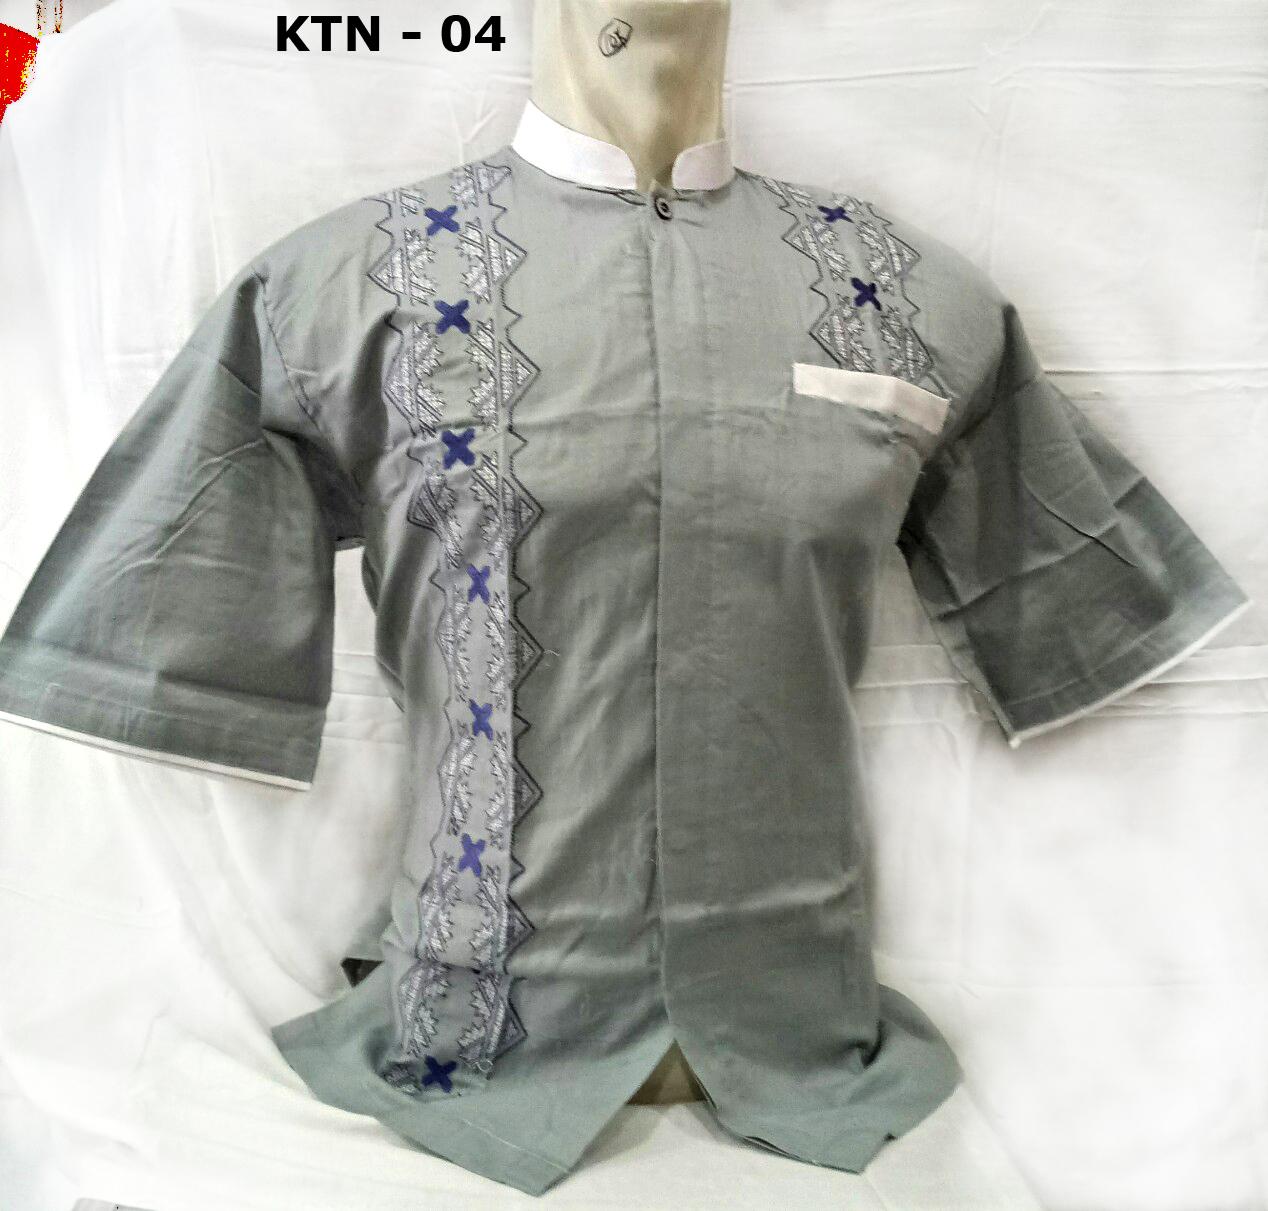 Model Baju Koko Terbaru Lebaran 2018 Lengan Pendek Murah